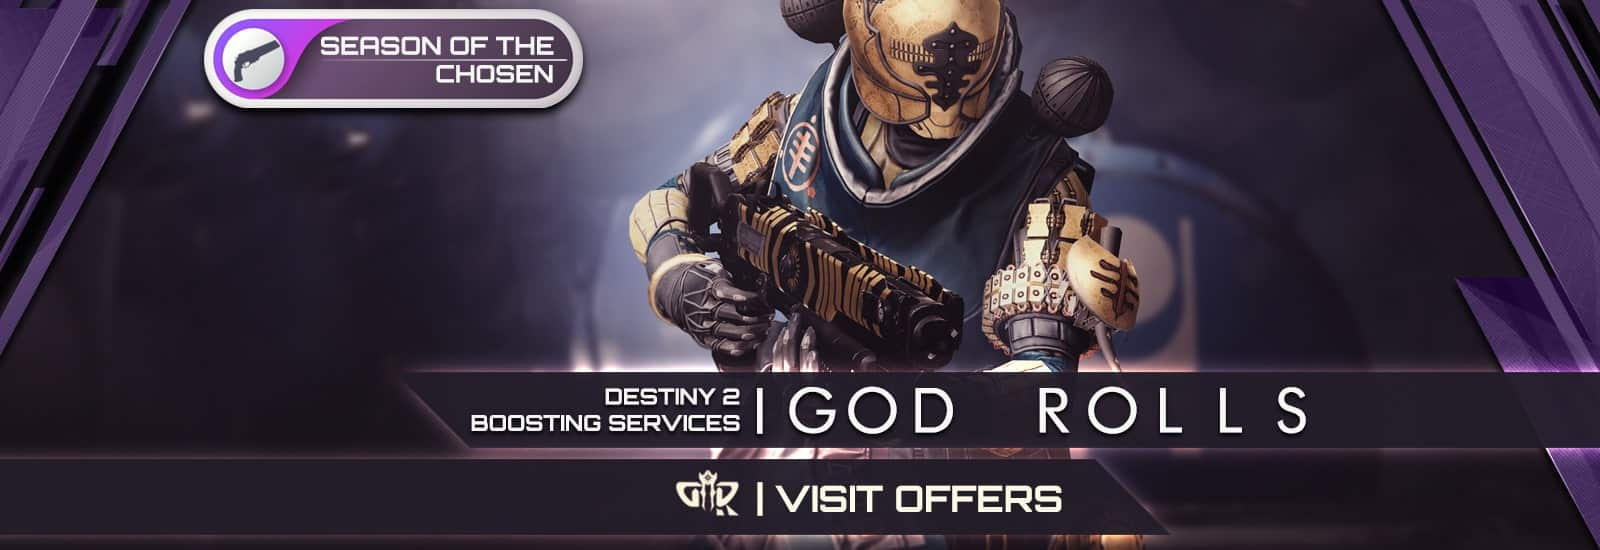 Destiny 2 Season of the Chosen God Rolls Boosting services - Destiny2Raiding-min